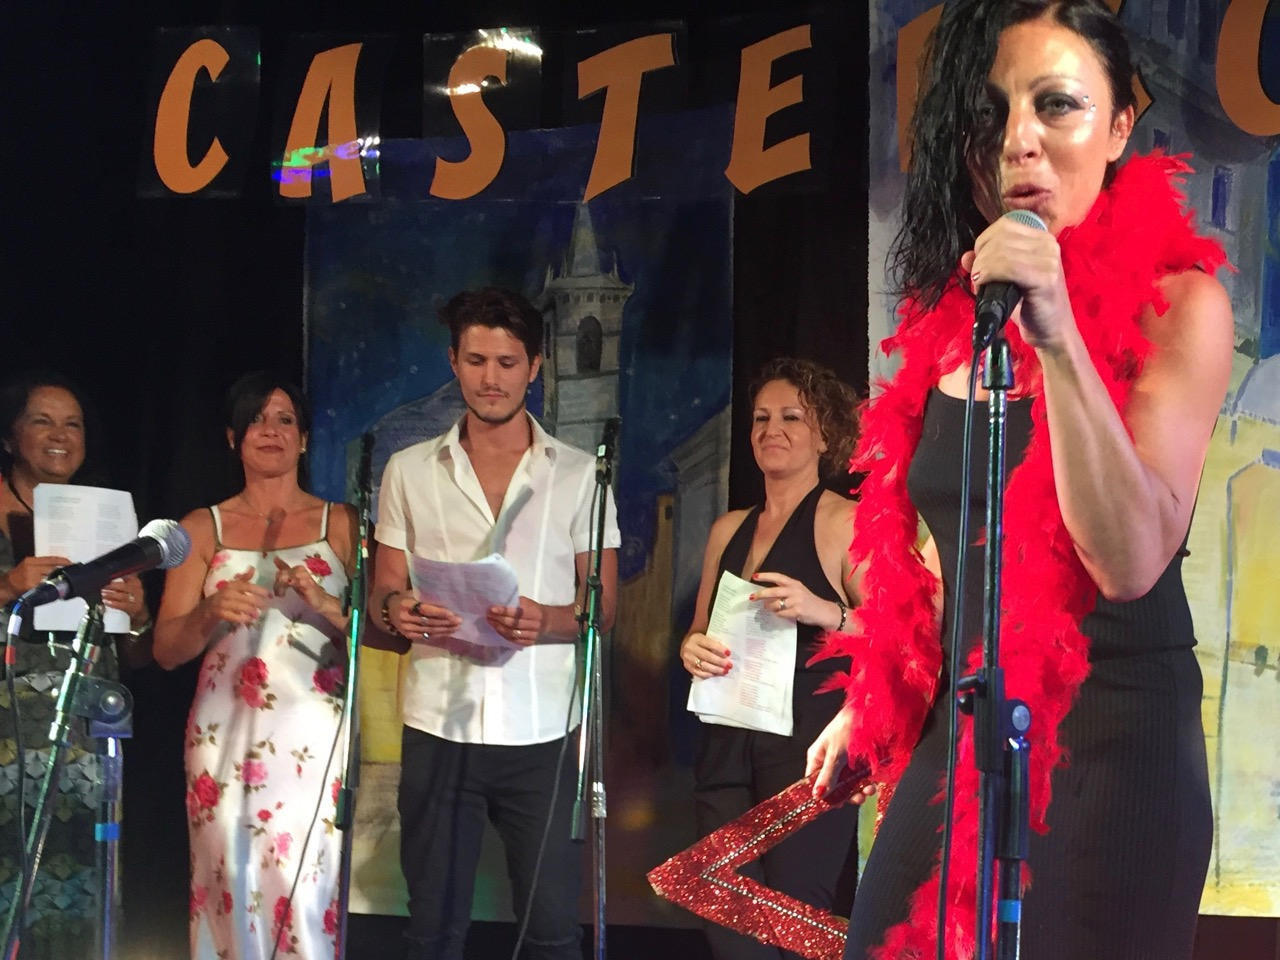 16-07-23 CASTELLO D'ORO 2016 - 49.jpg